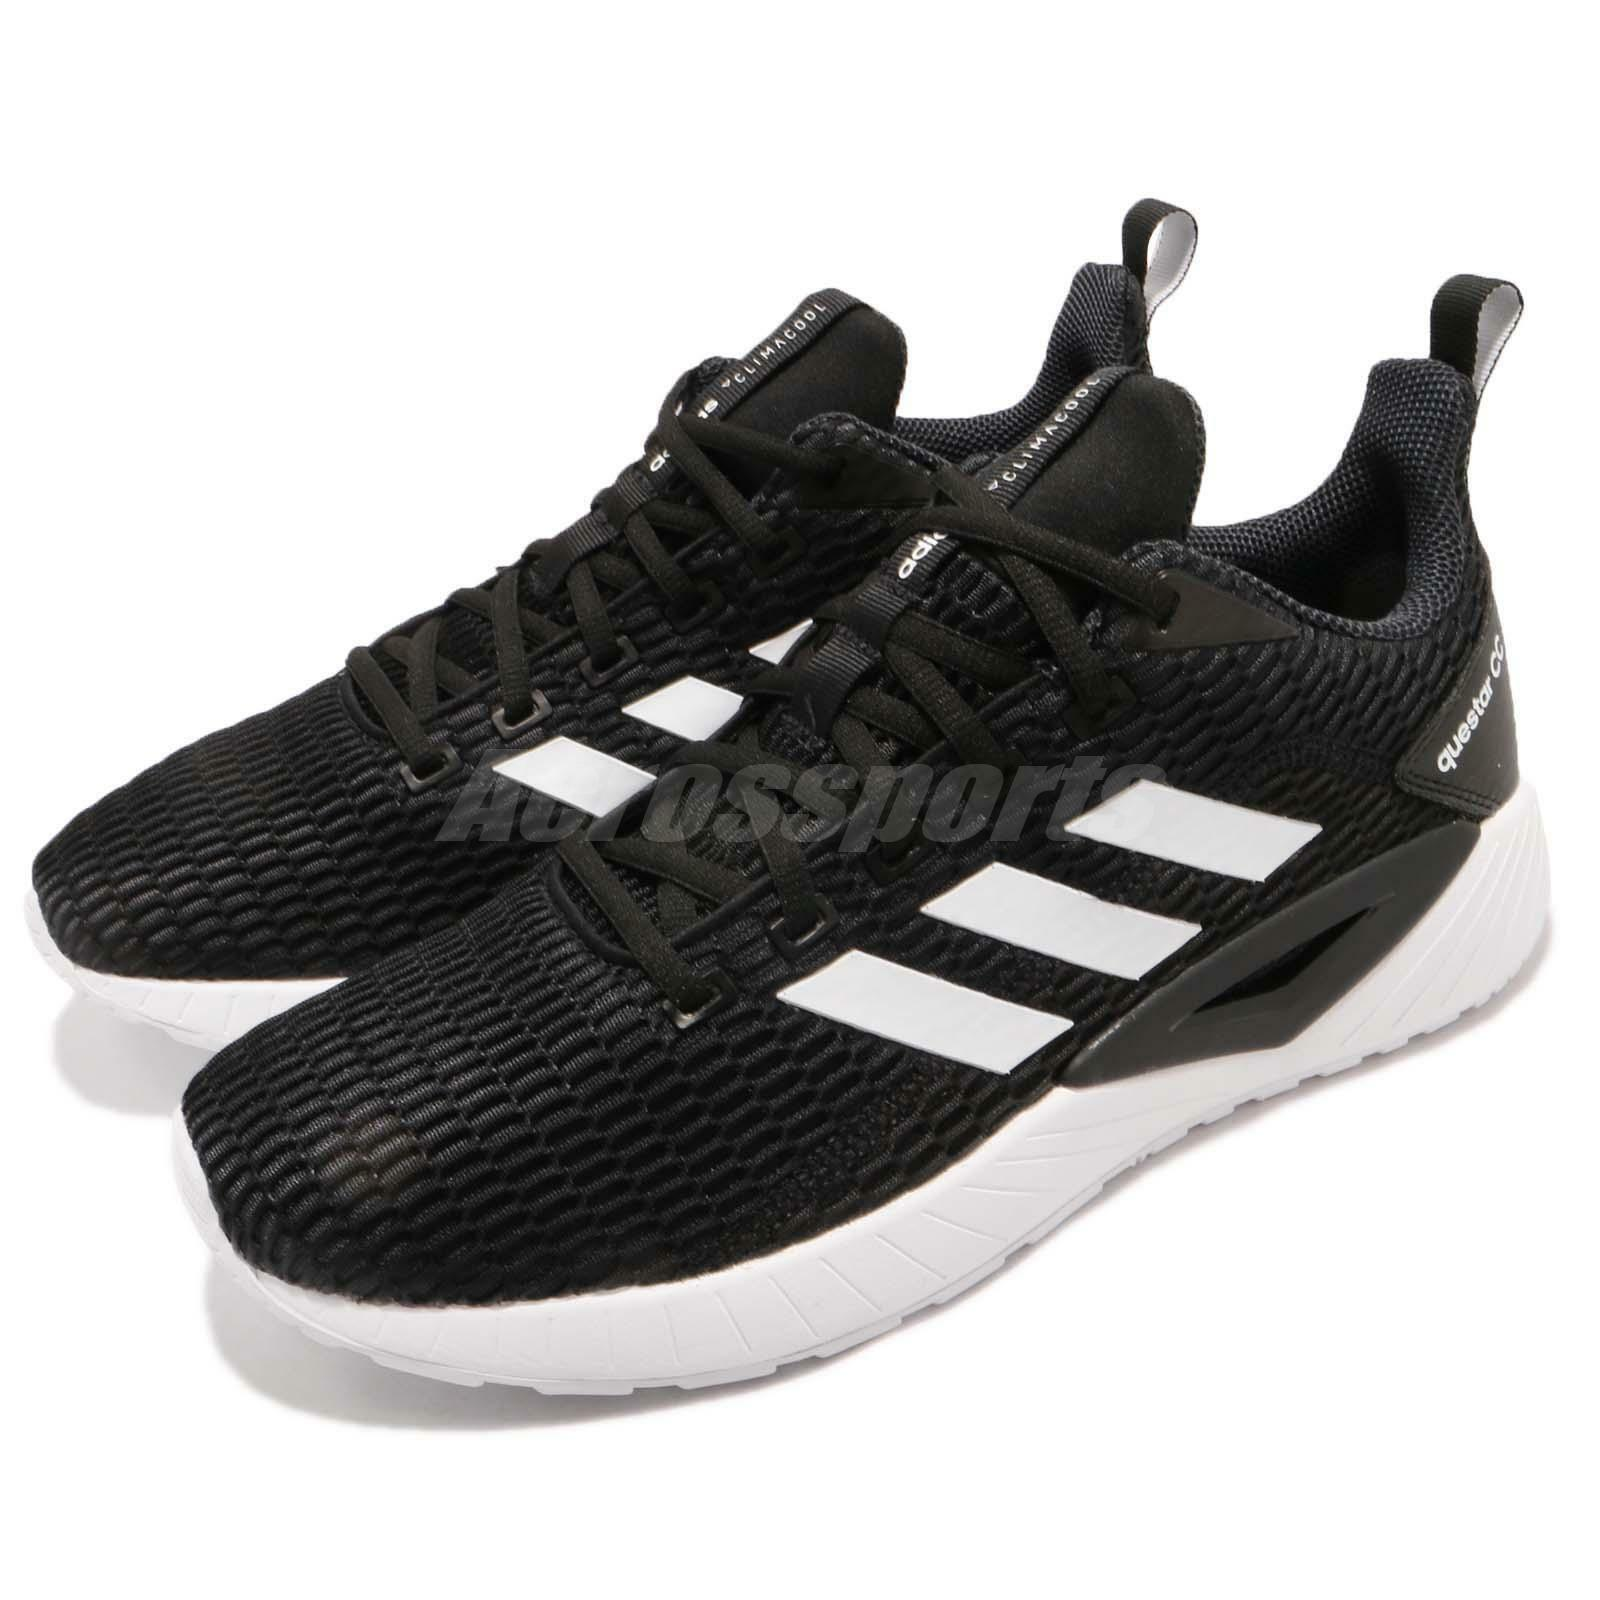 Adidas Questar CC Core Blcke Footwear blanco Men Running zapatos zapatillas DB1159